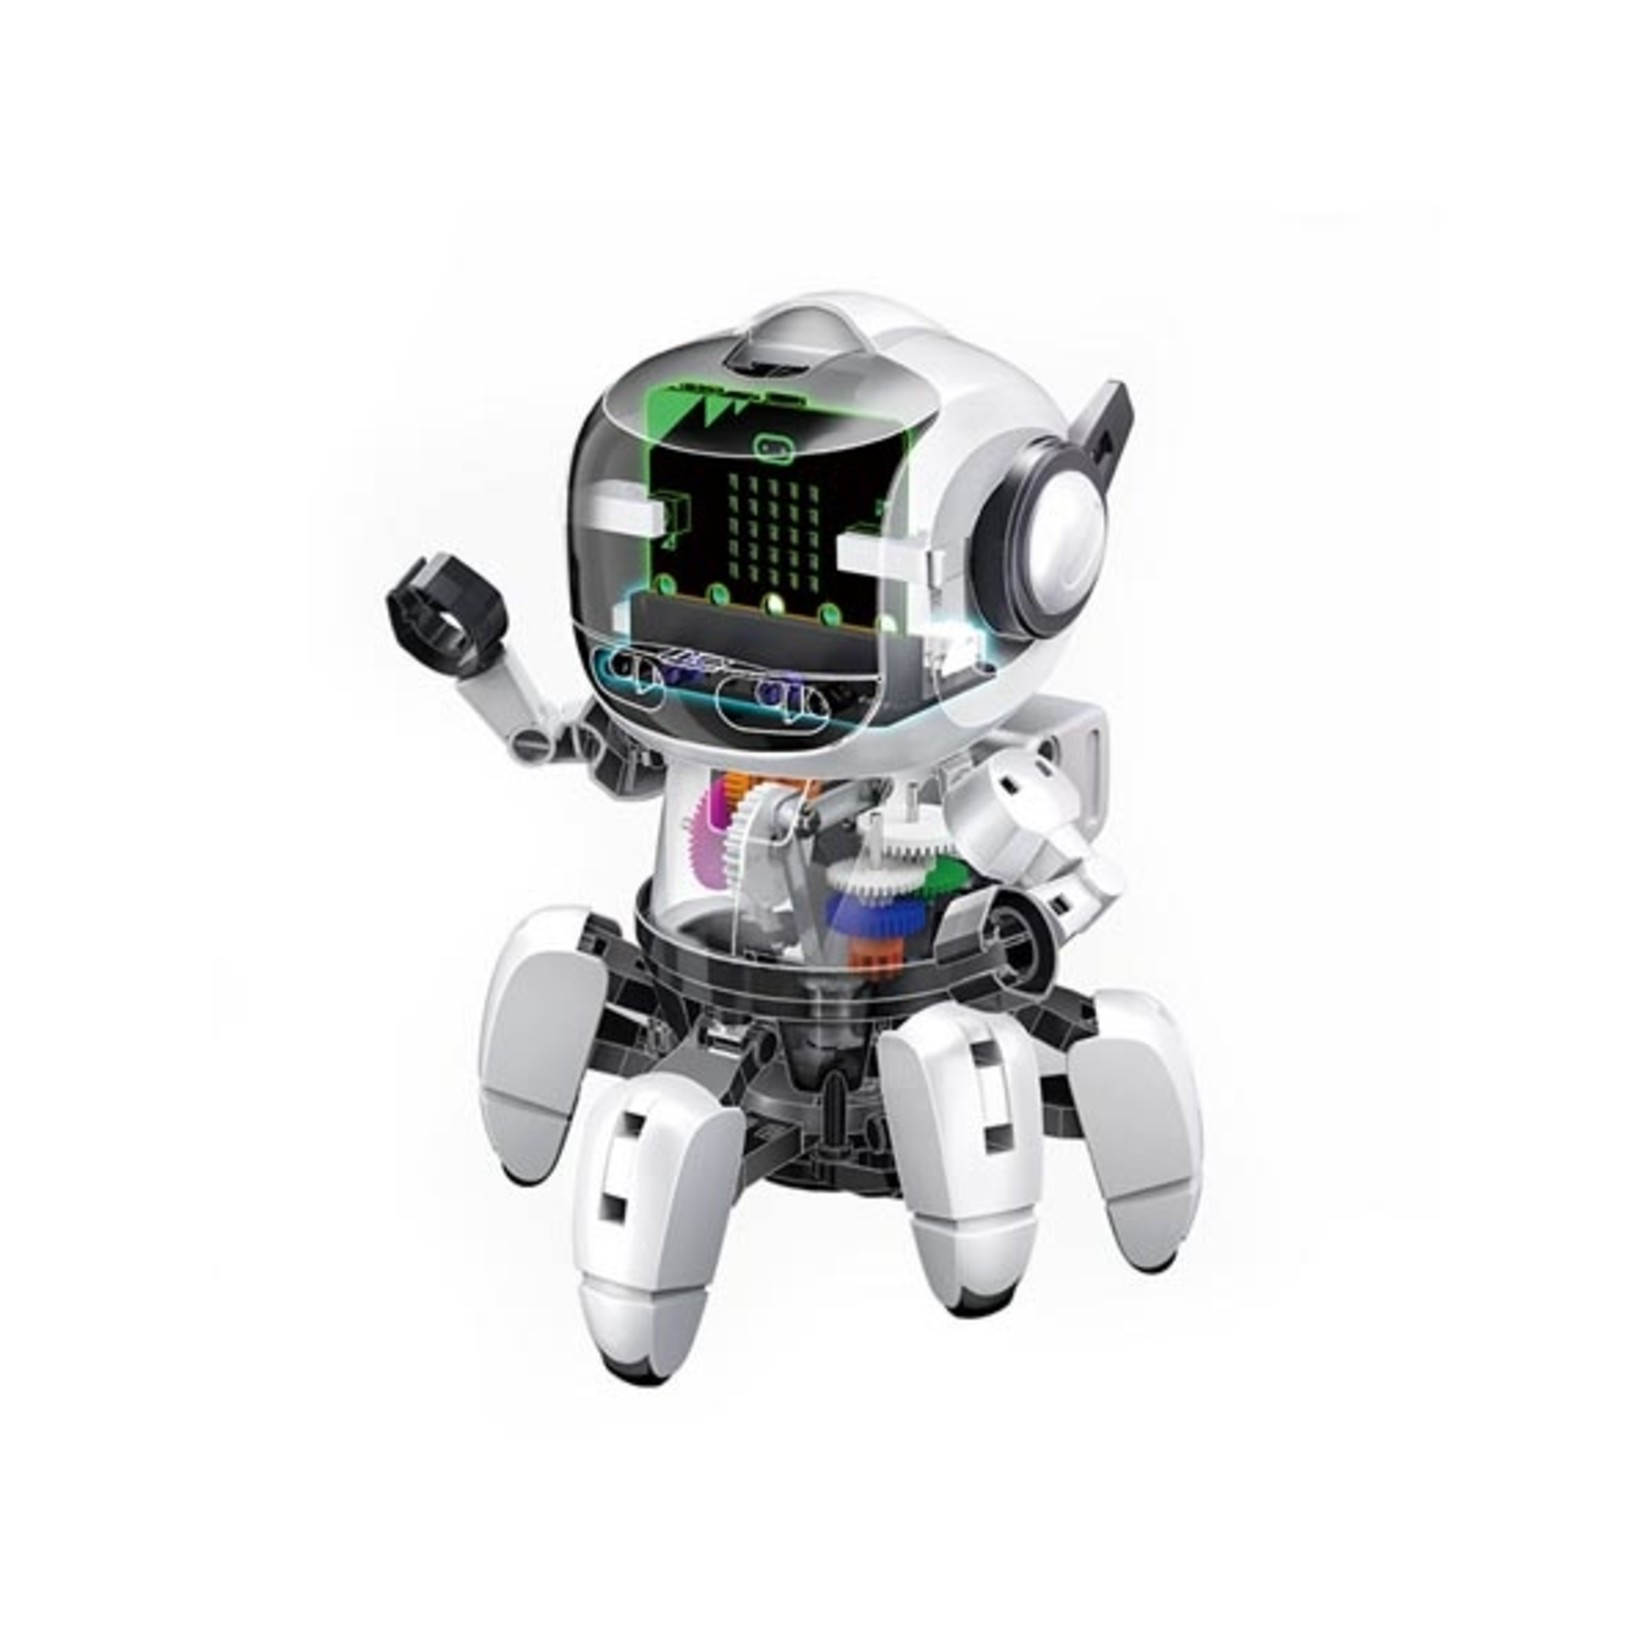 Velleman TOBBIE II micro:bit kit